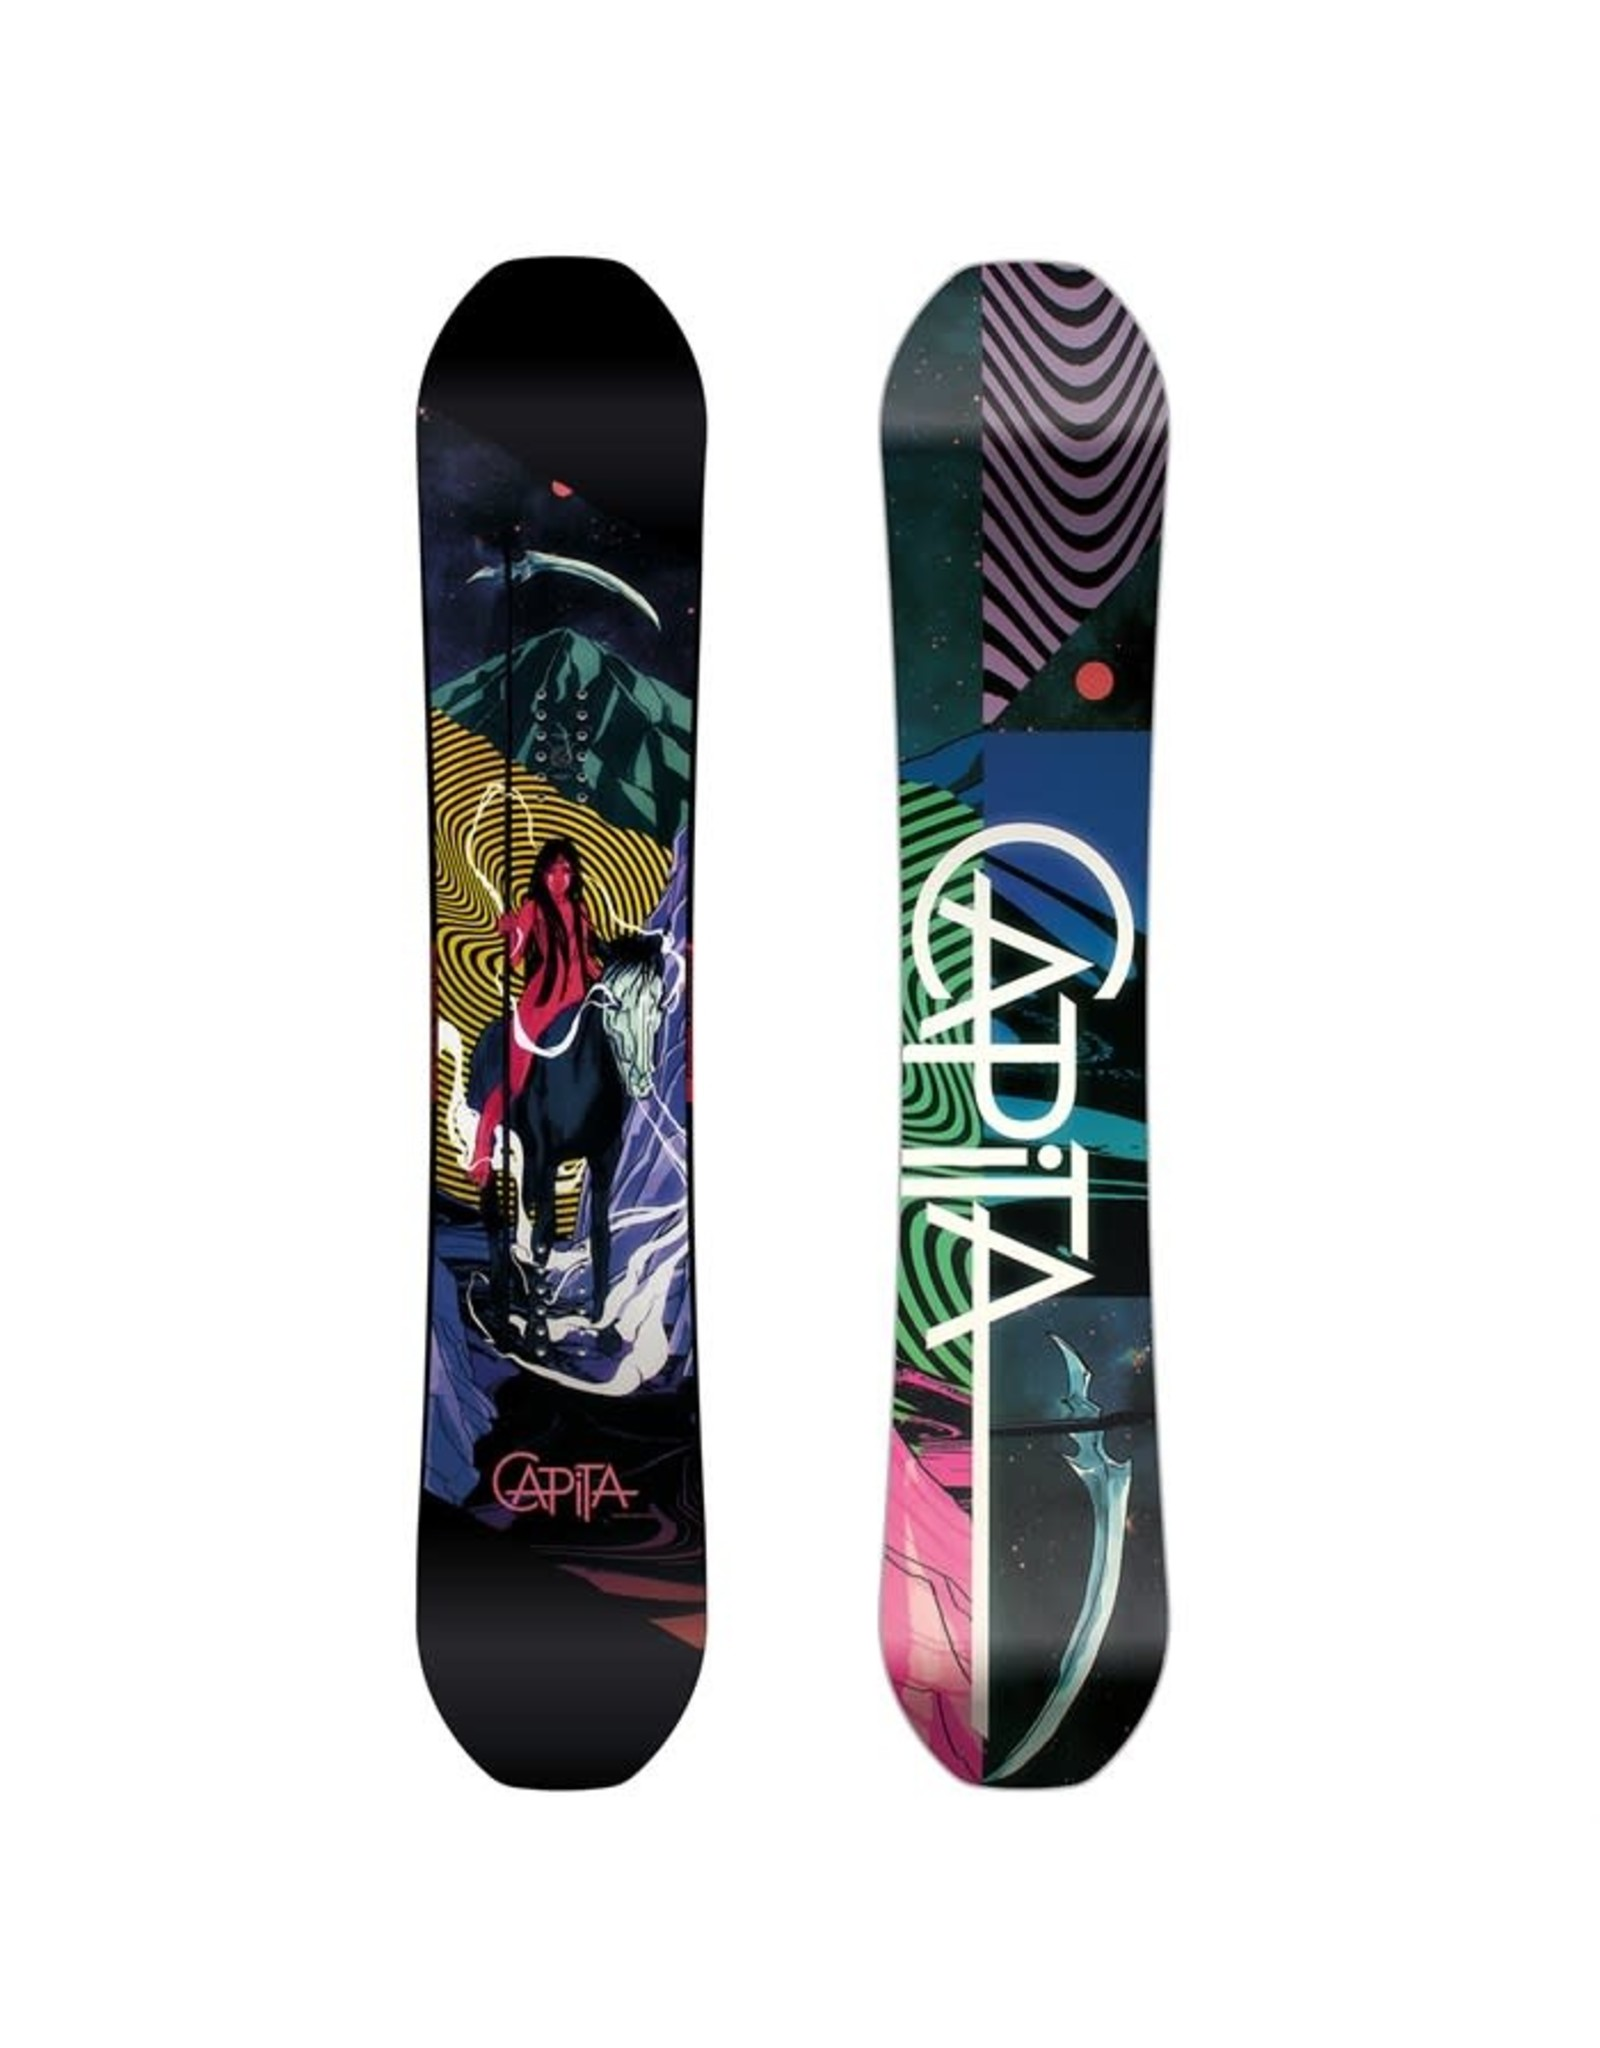 CAPITA CAPITA 2020 INDOOR SURVIVAL SNOWBOARD